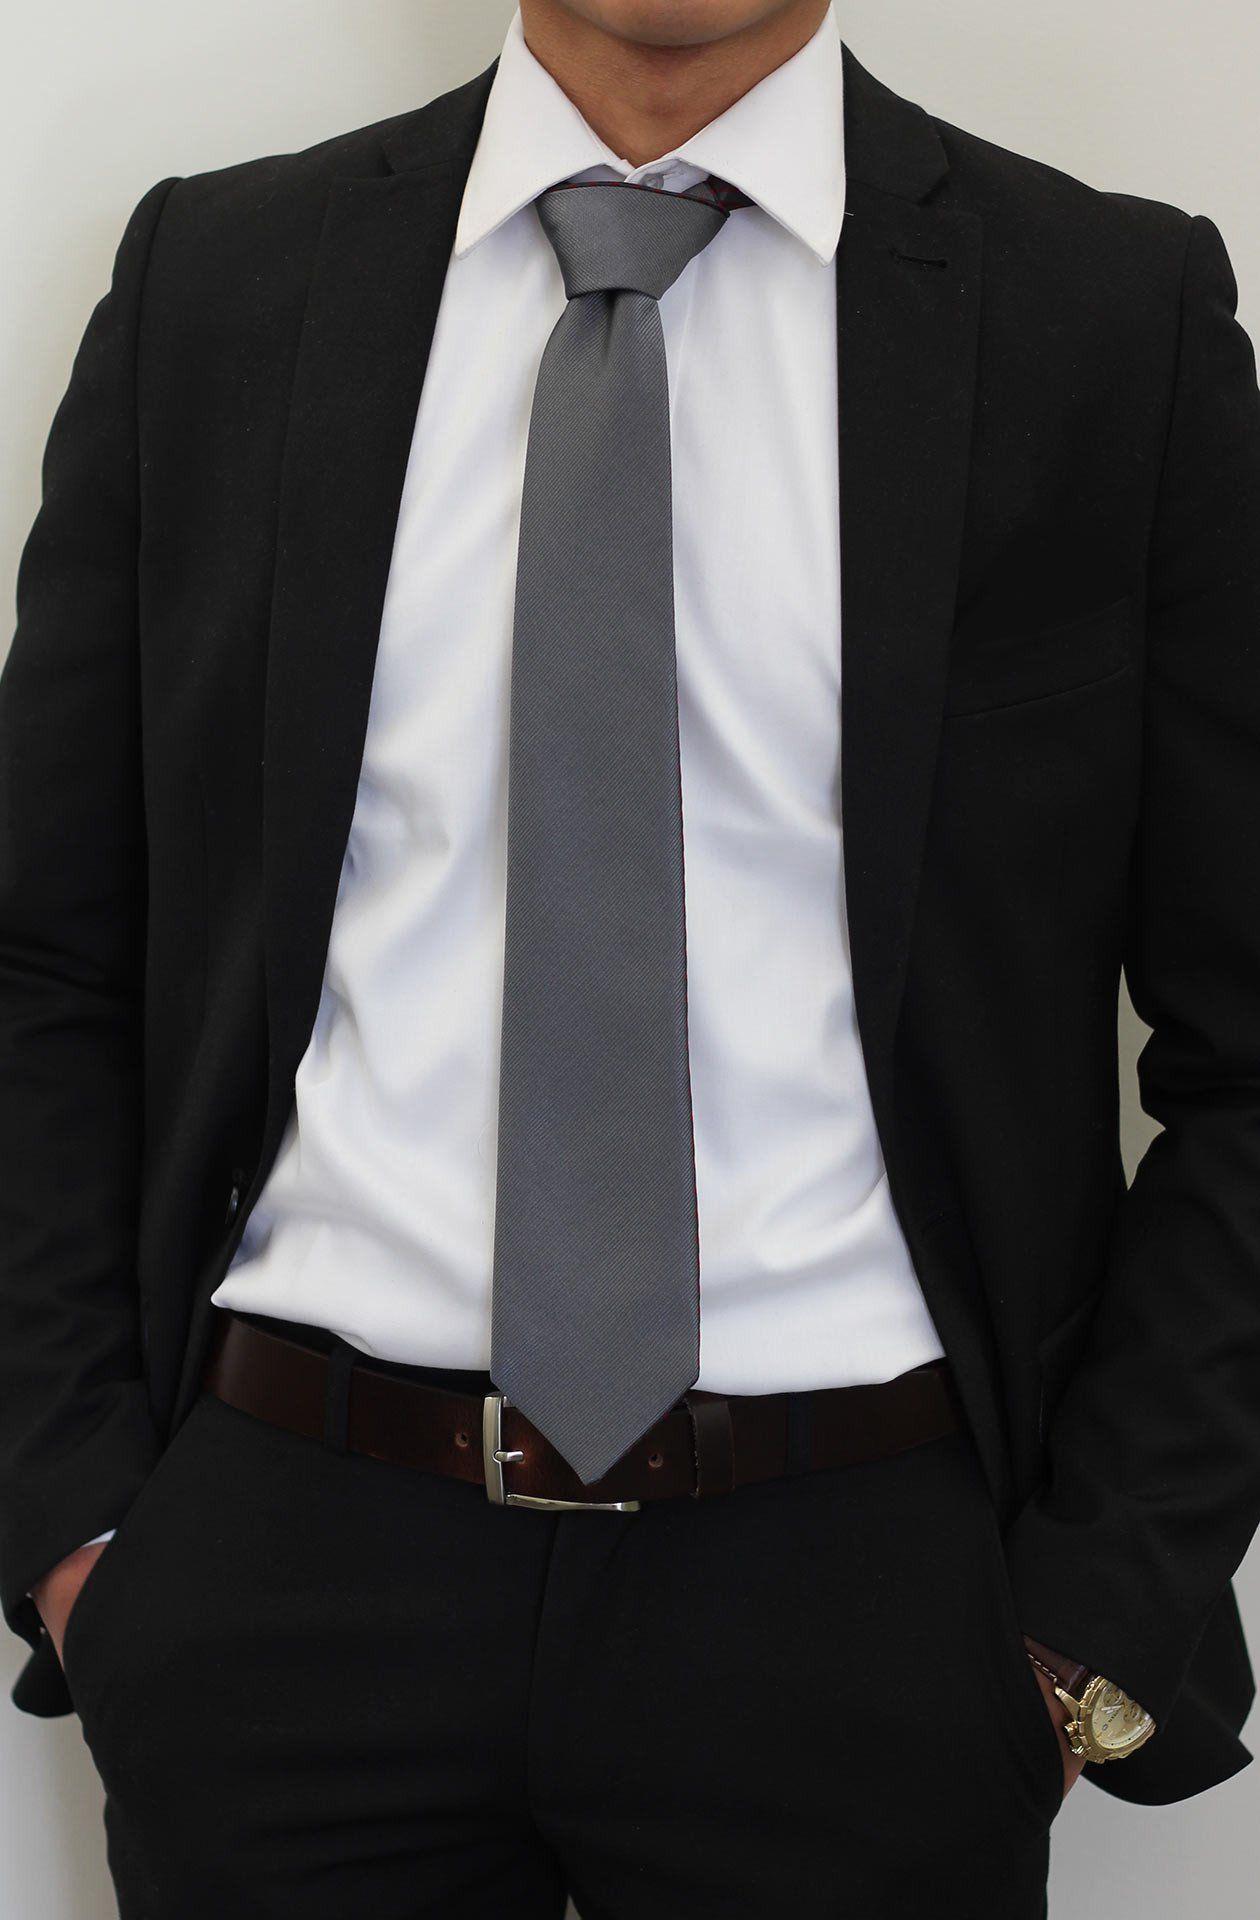 Charcoal Grey in 2020 Groom wear, Wedding suits, Groom